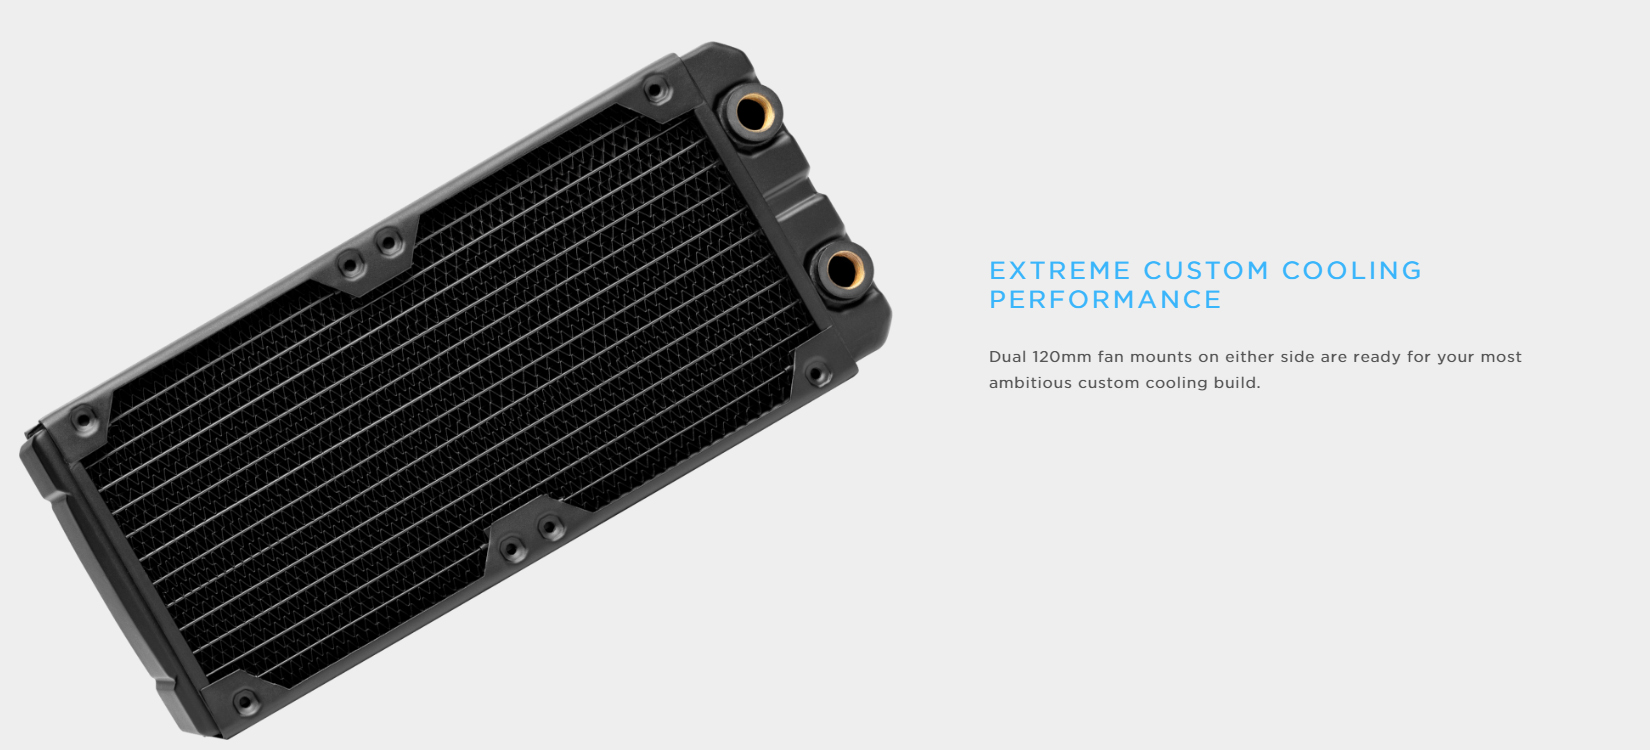 Corsair Hydro X Series XR5 240 (2x120mm radiator; 33mm thick) (CX-9030002-WW )